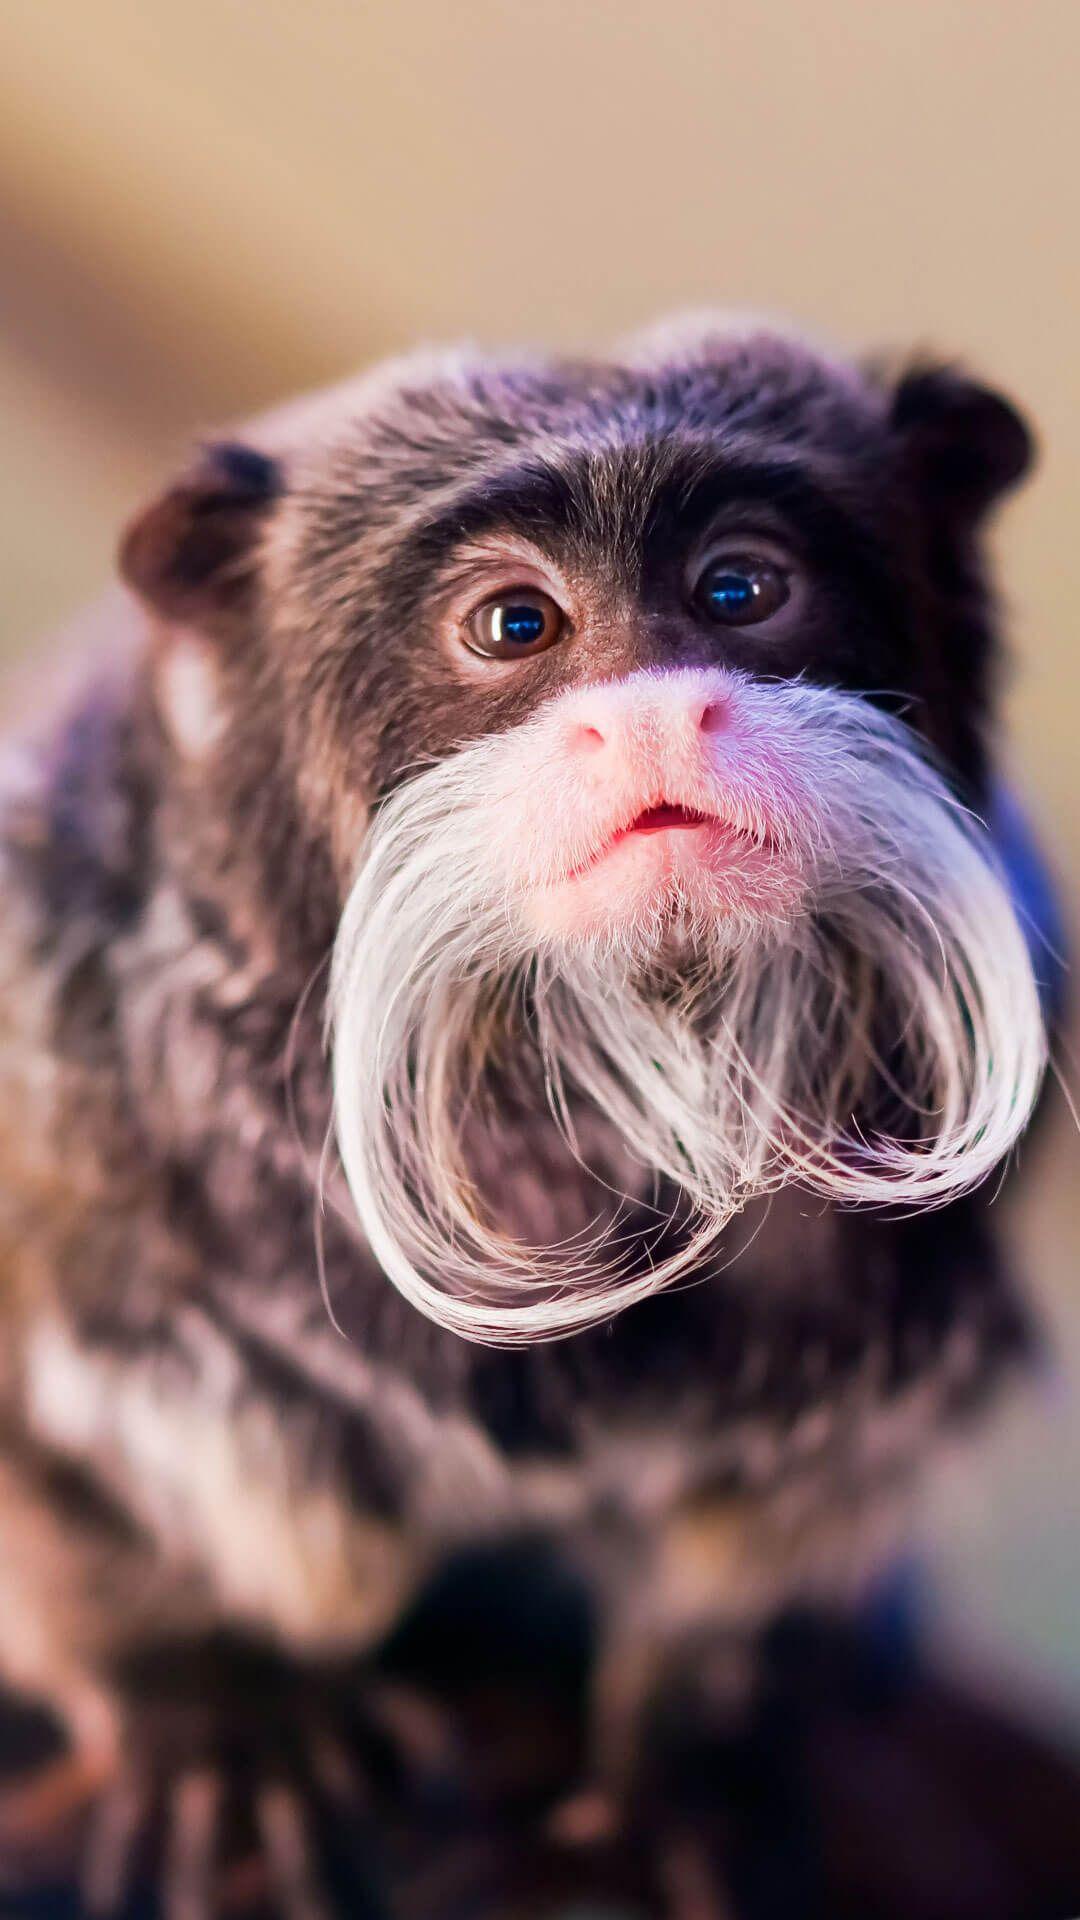 Cute Monkey Wallpaper For IPhone 6 HD